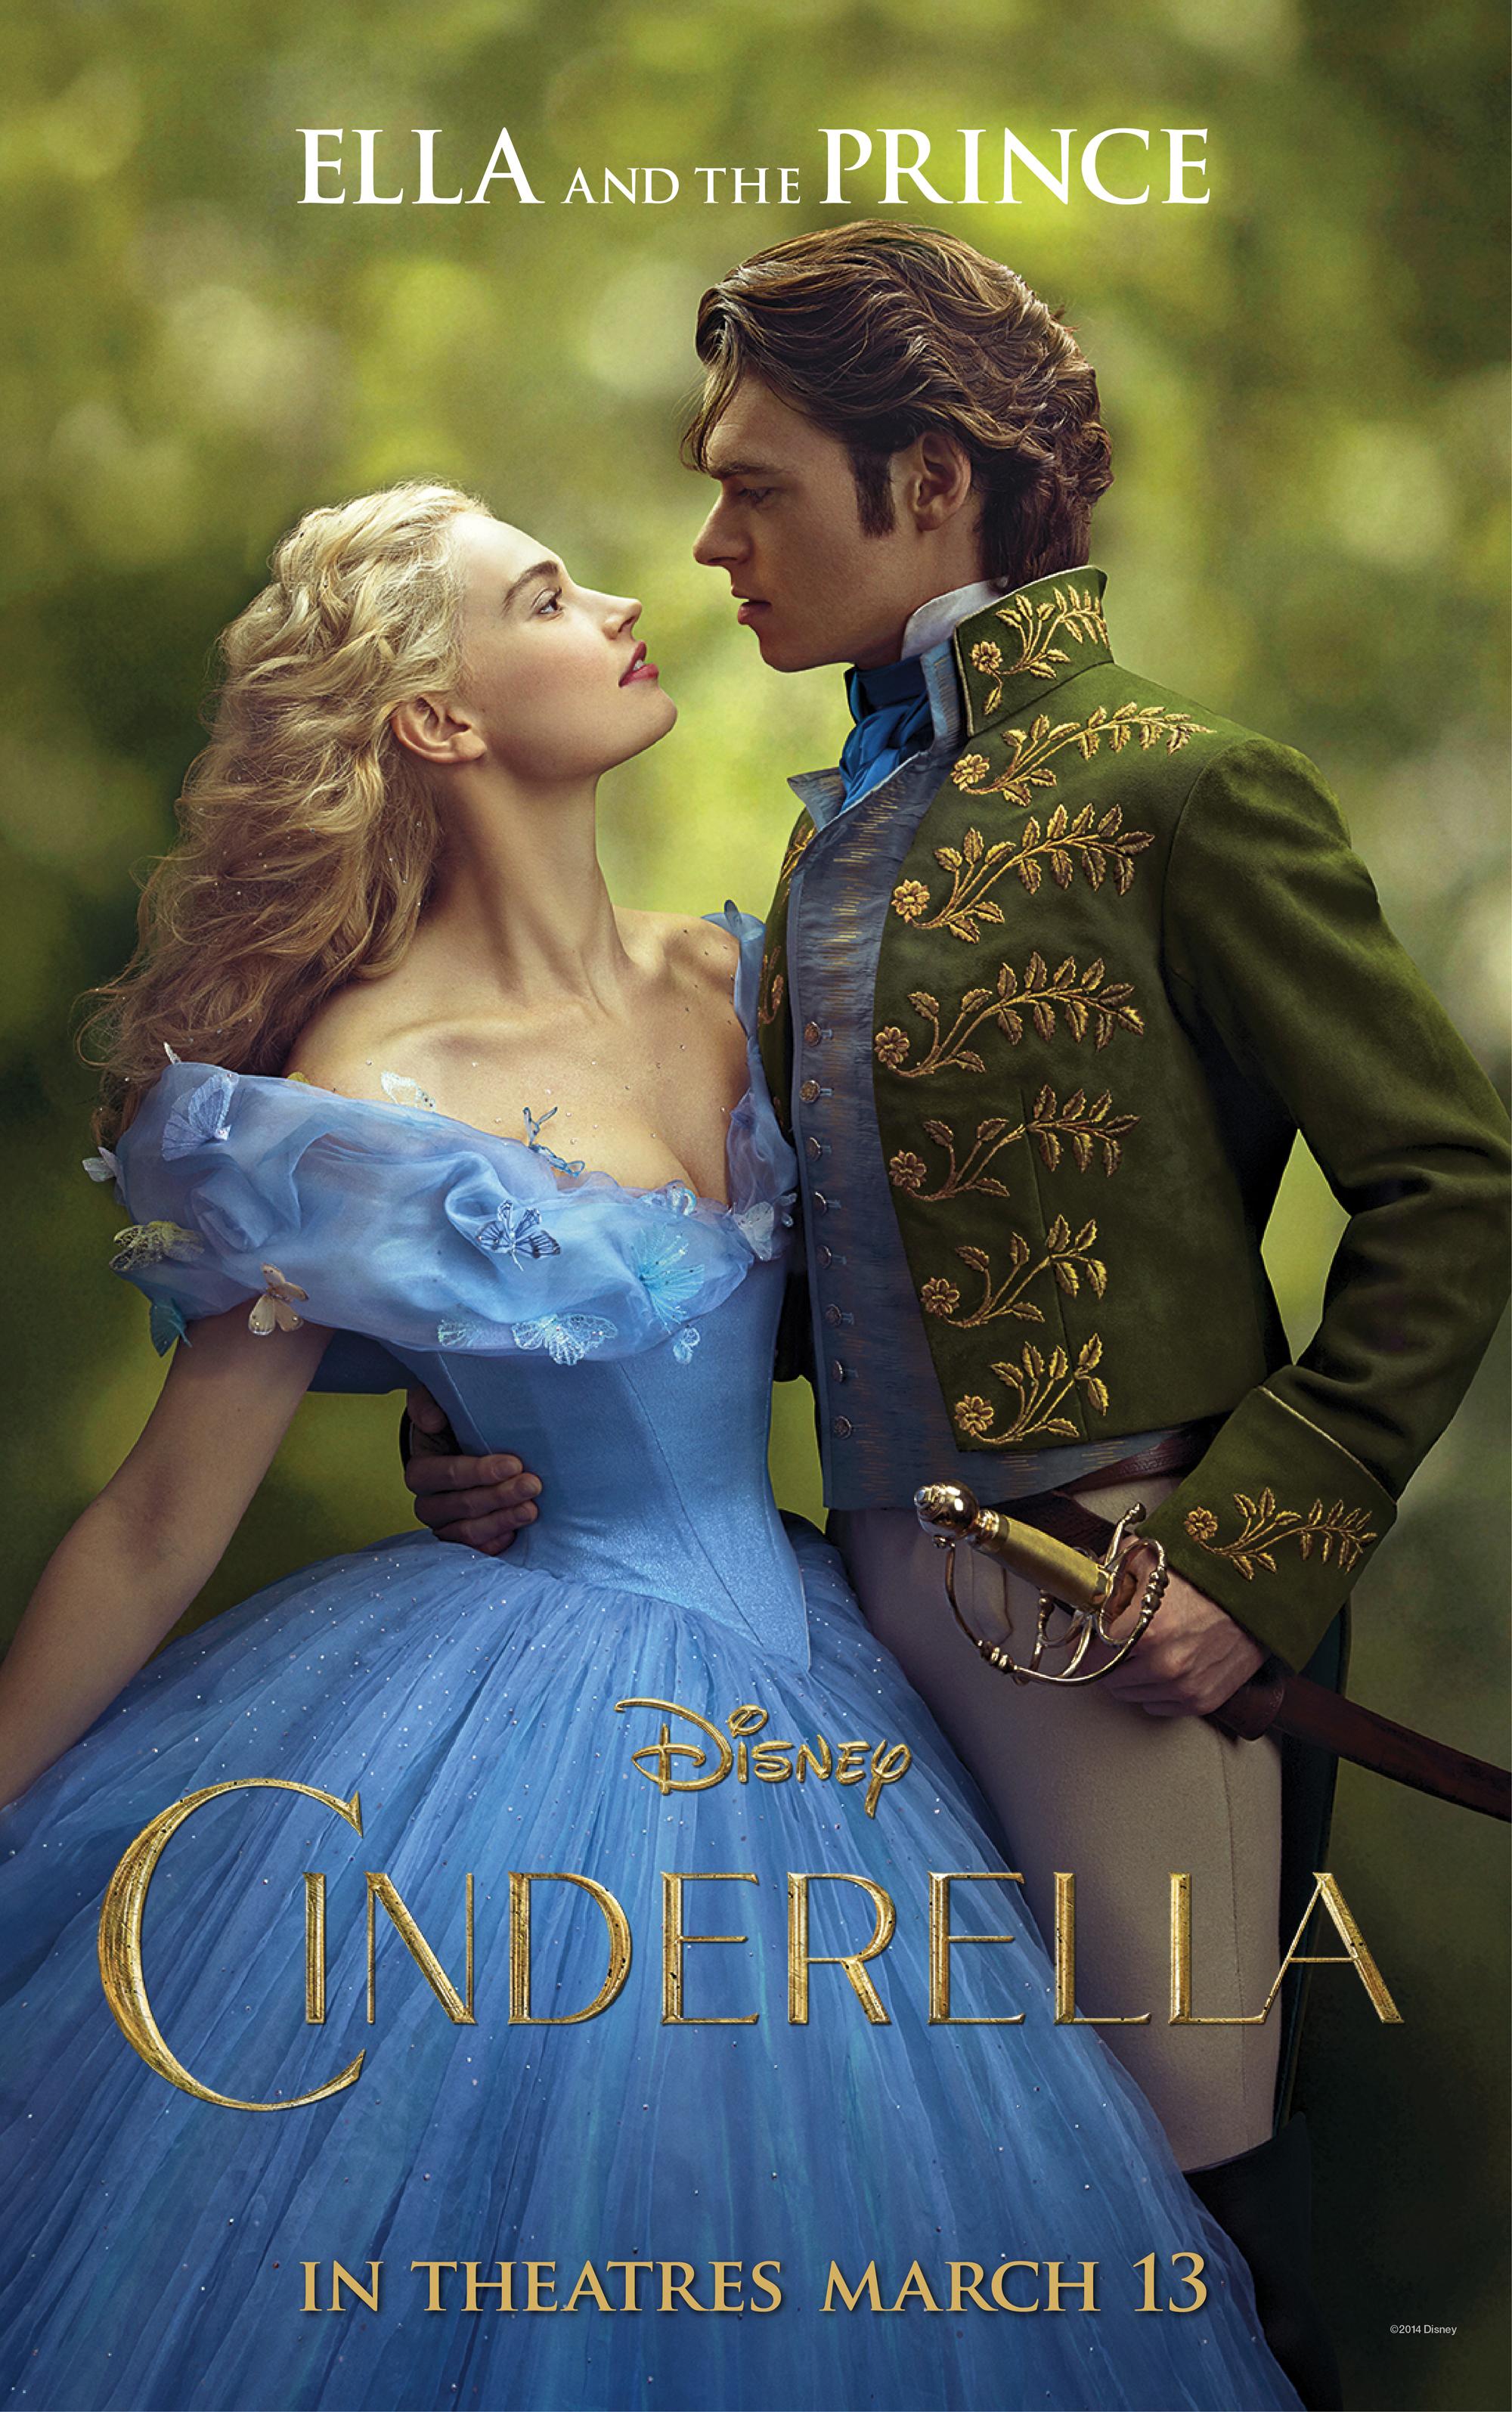 https://www.film.ru/sites/default/files/movies/posters/cinderella-poster-lily-james-richard-madden.jpg